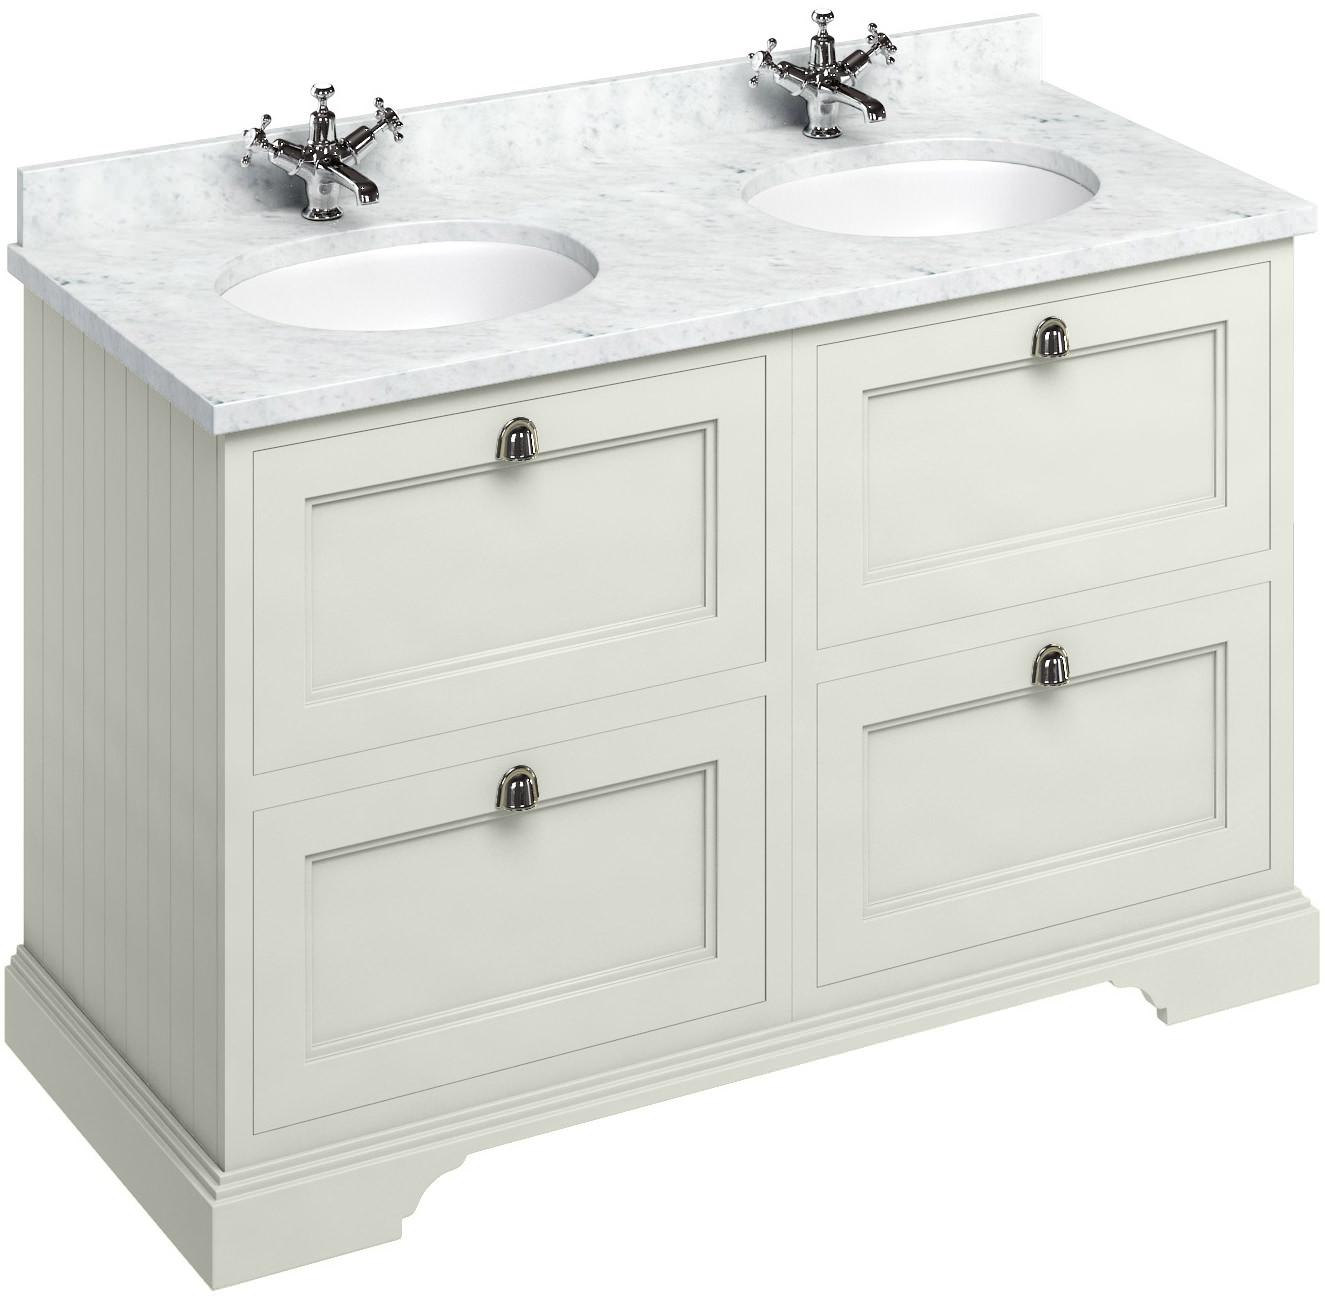 burlington sand 1300mm 4 drawer unit and worktop with basin